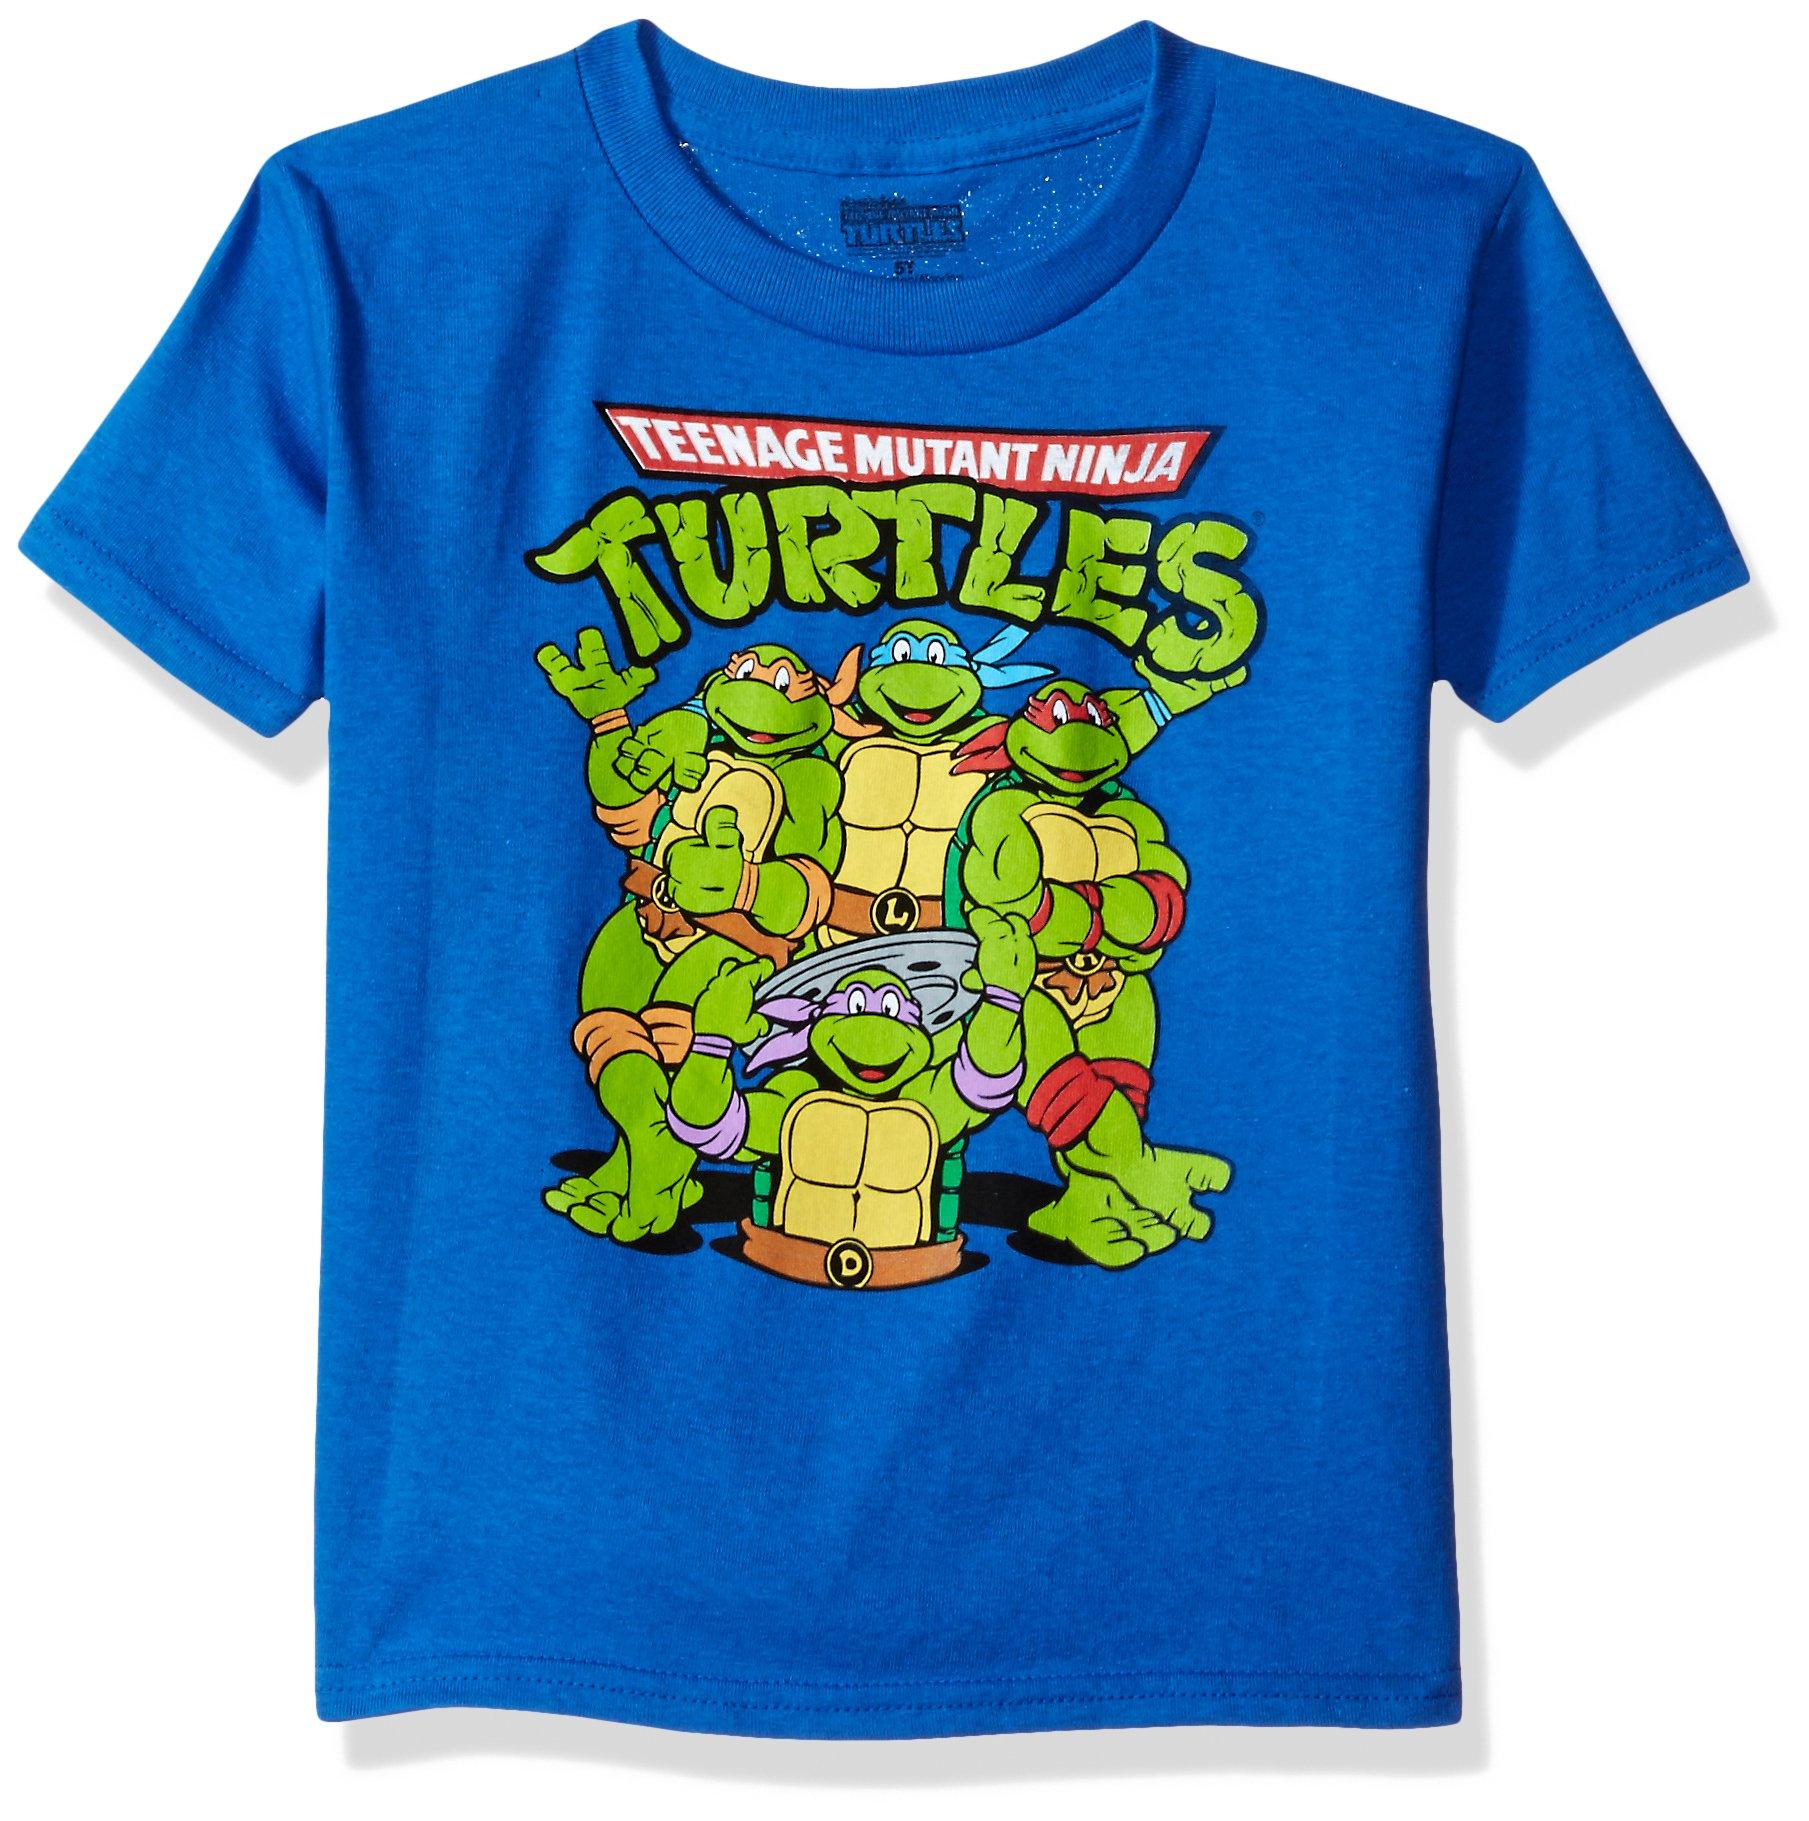 Nickelodeon Toddler Boys Teenage Mutant Ninja Turtles Short Sleeve T-Shirt, Royal, 5T